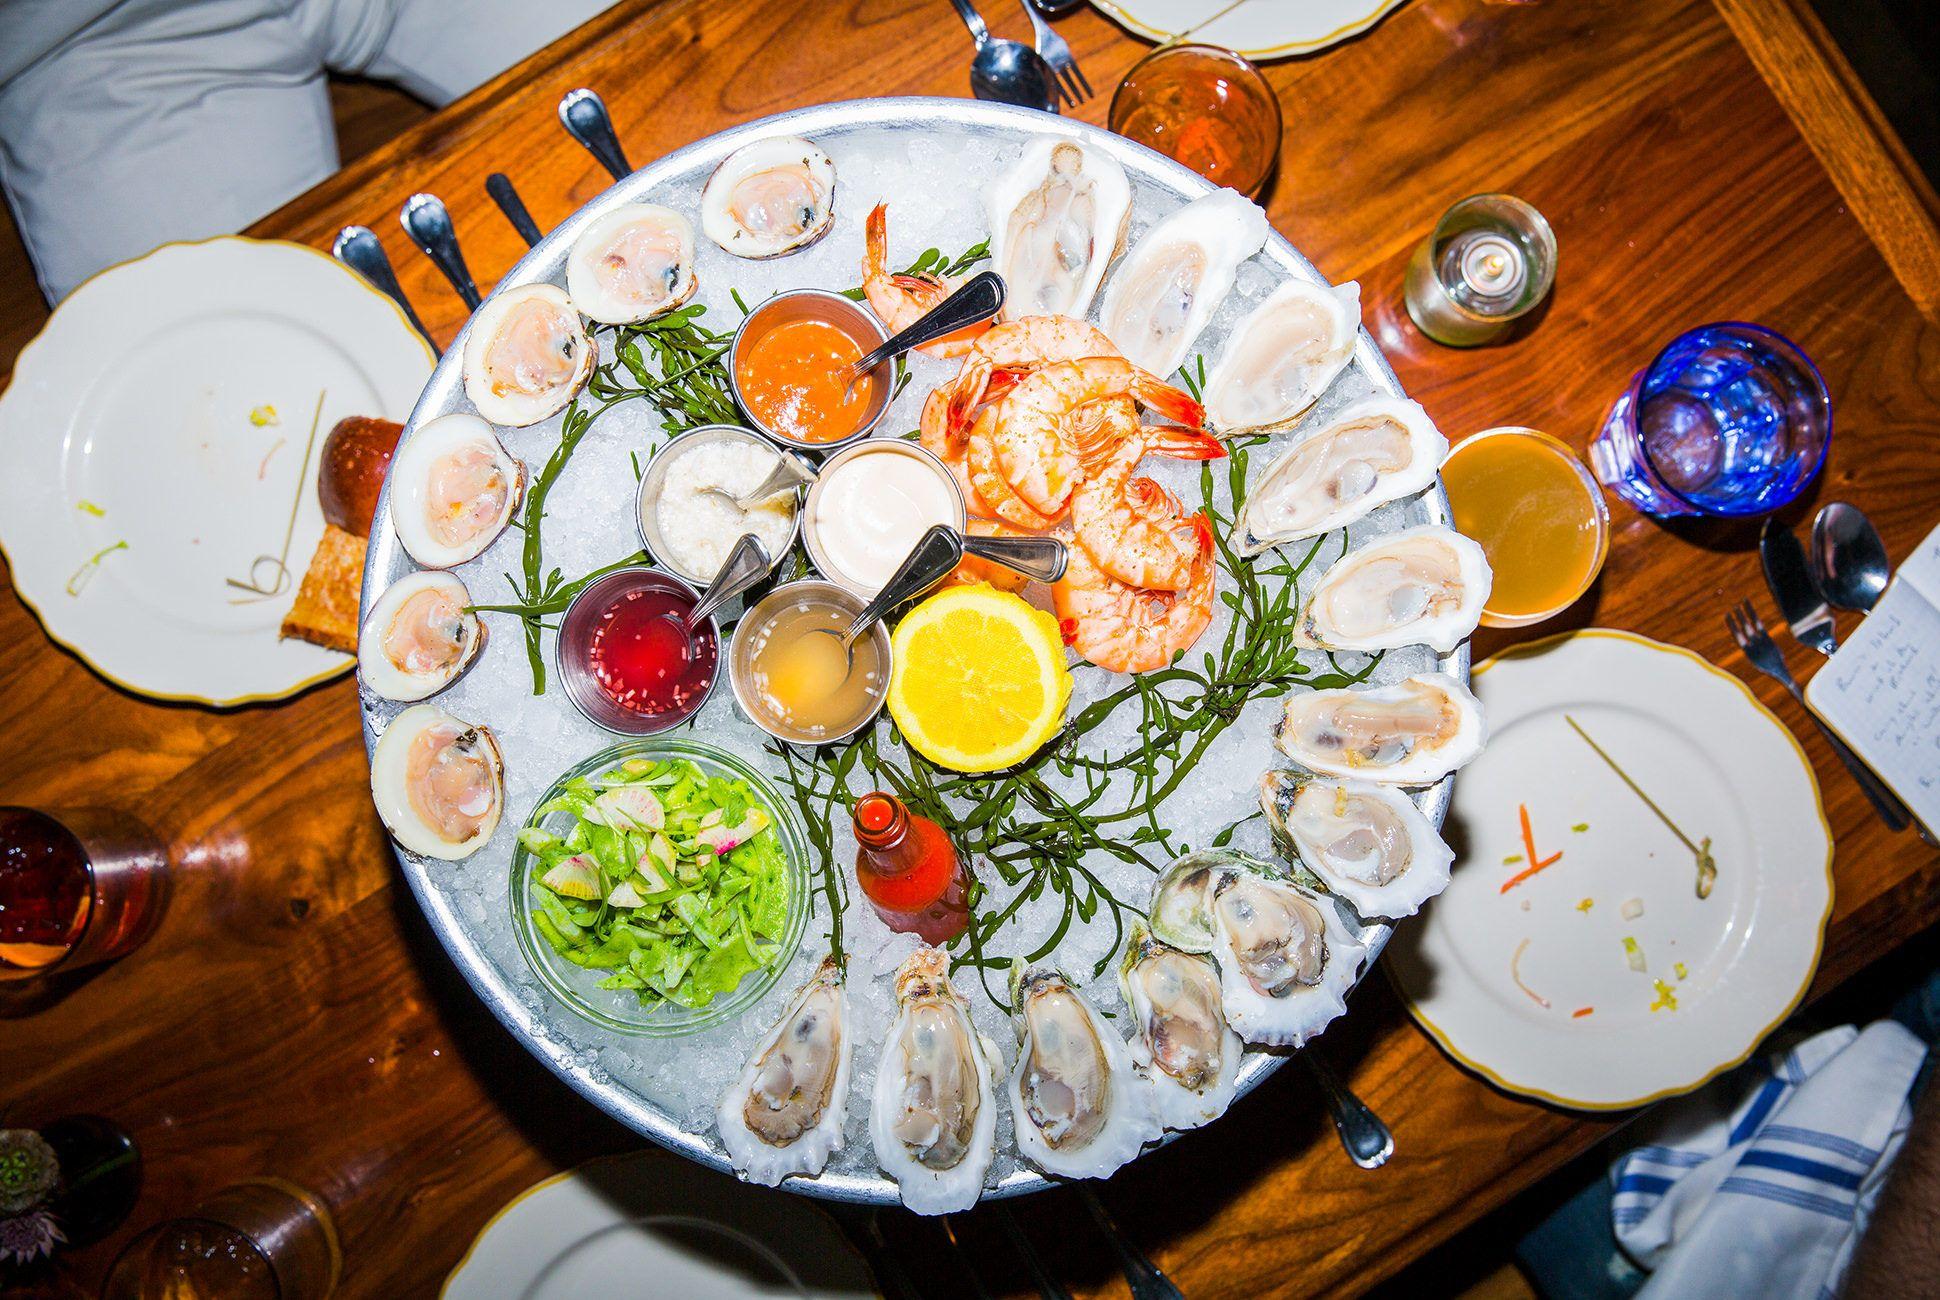 Mike-Lata-Charleston-Seafood-Gear-Patrol-Ordinary-4